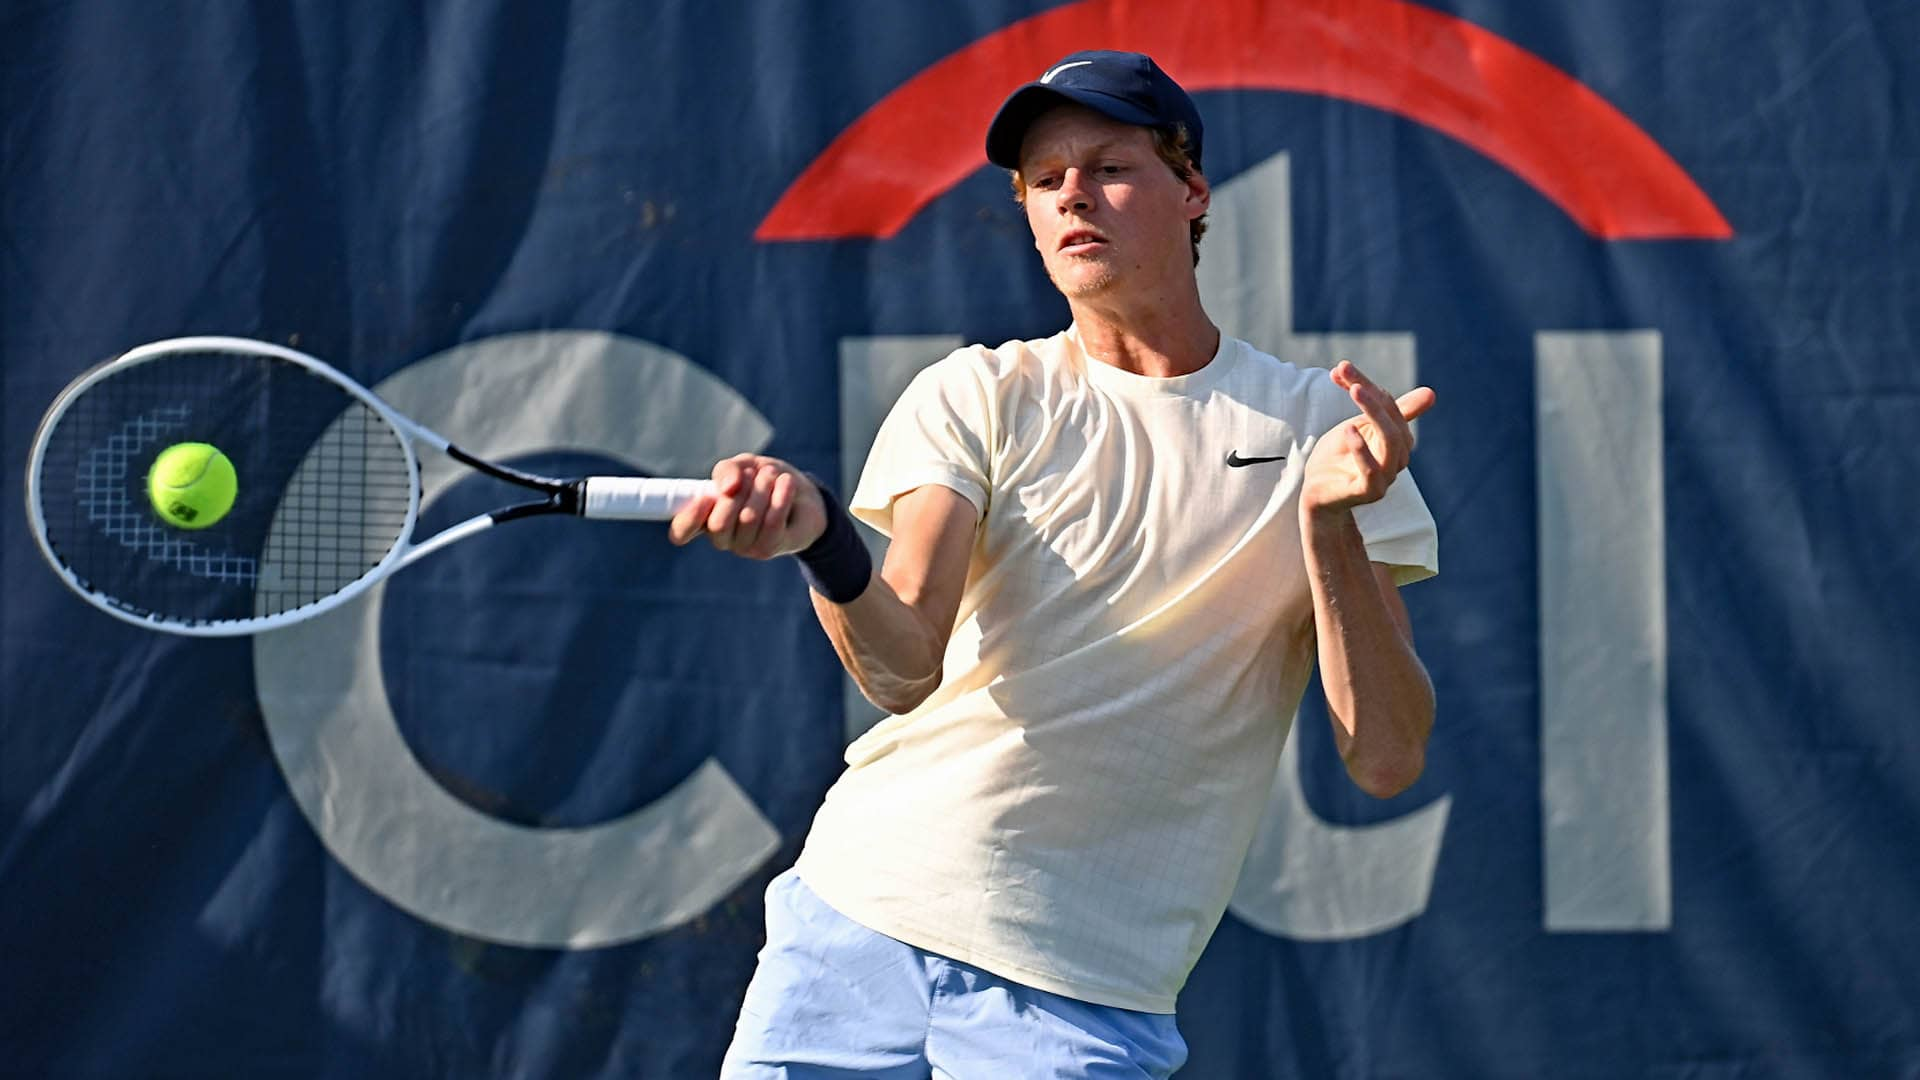 Washington Open 2021: Jannik Sinner vs. Steve Johnson Tennis Pick and Prediction